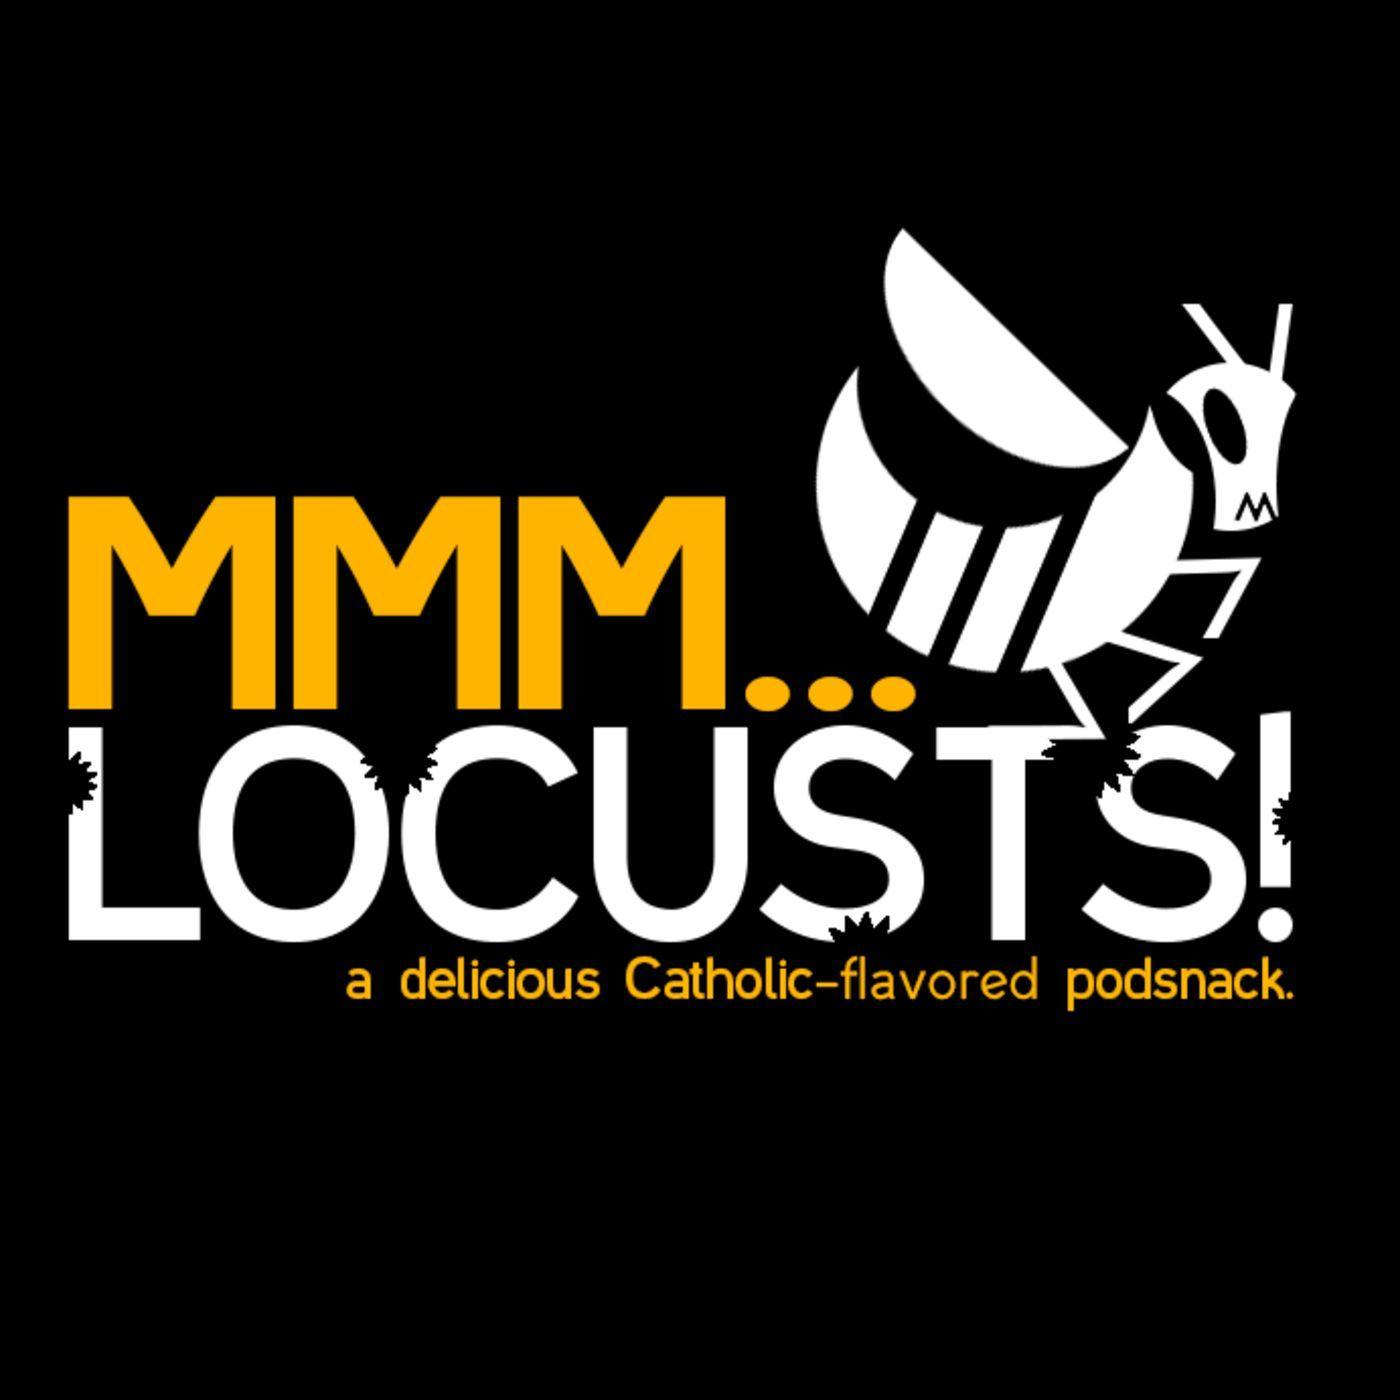 MMM...Locusts!